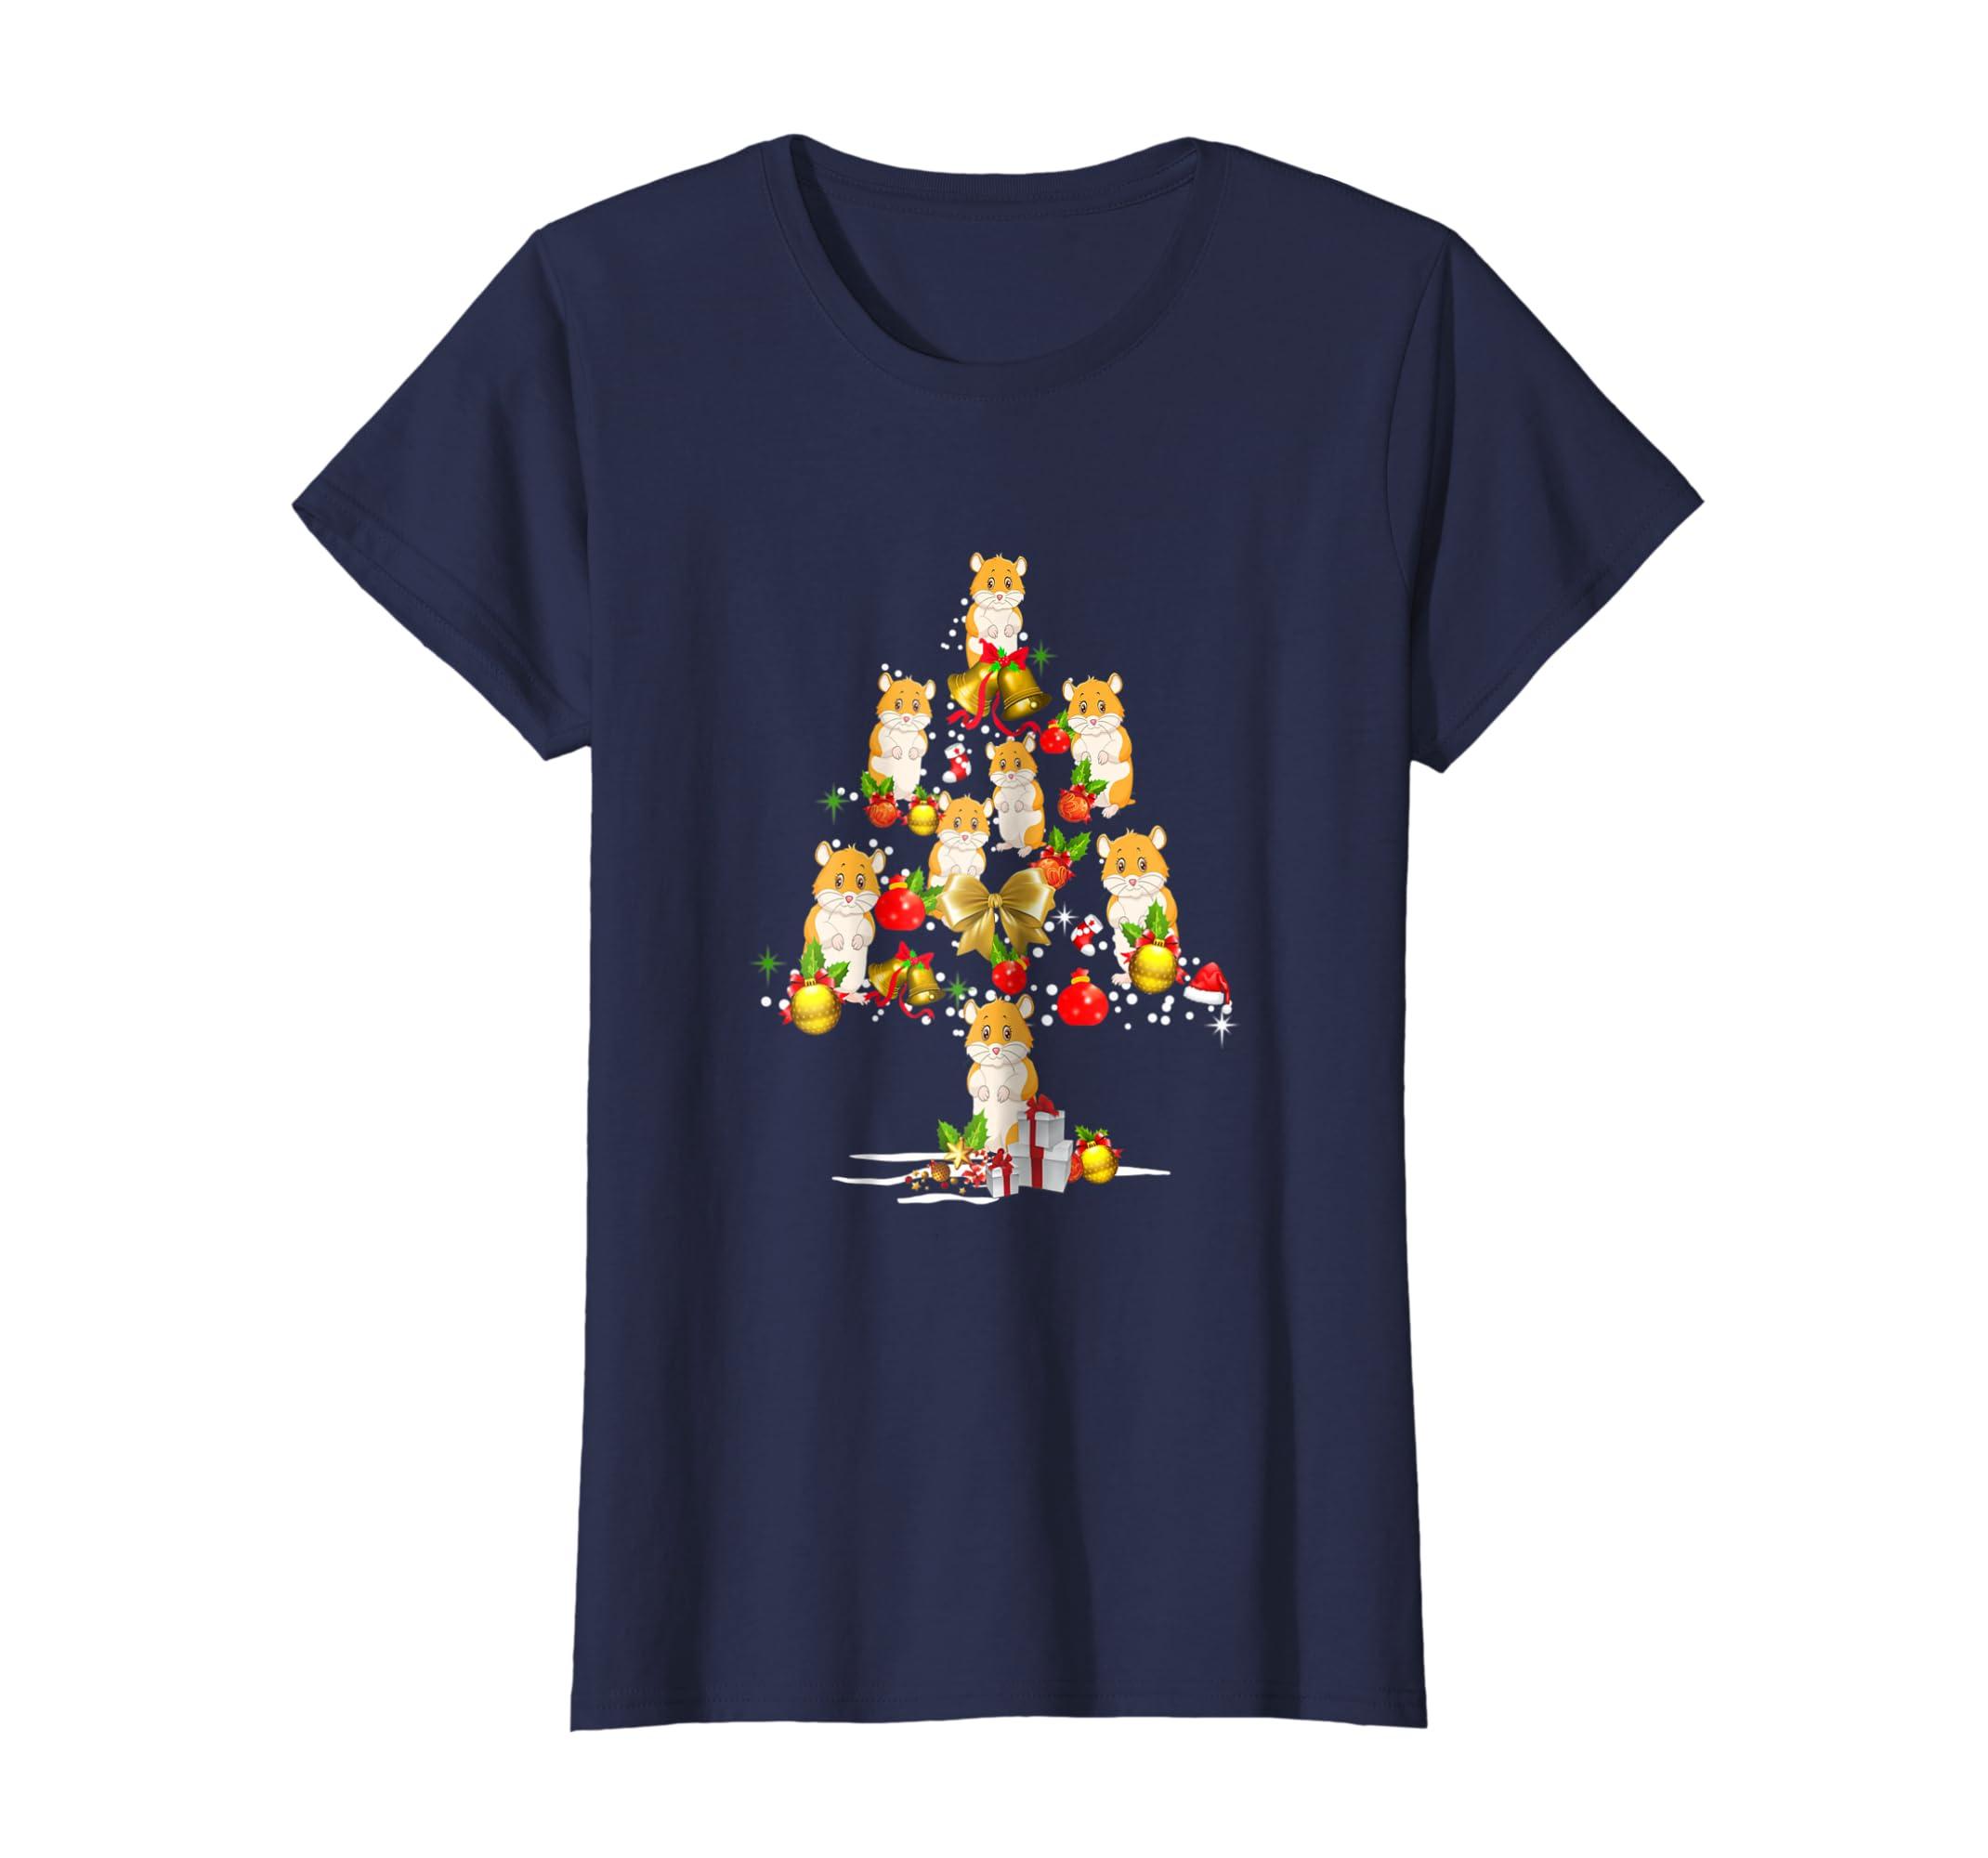 357b87e7639 Amazon.com  Hamster Christmas Tree T-Shirts Funny Xmas Costume Cute Gift   Clothing